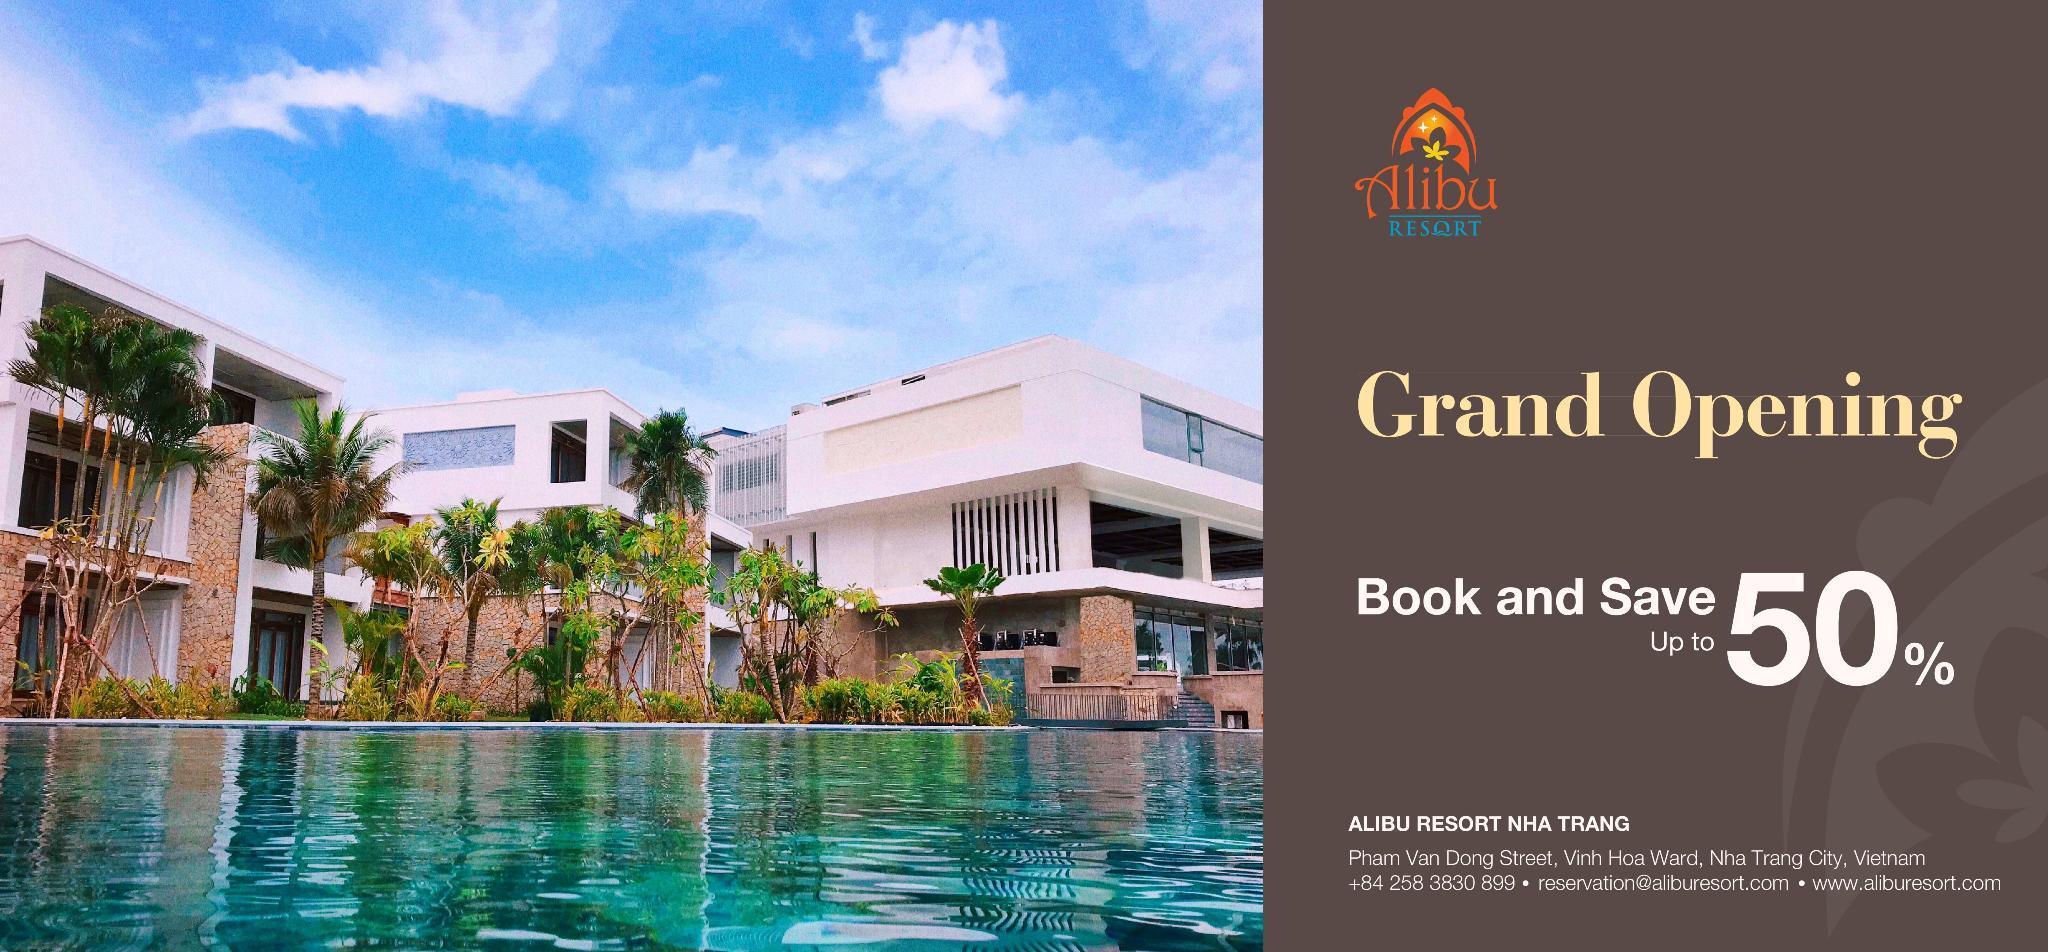 Alibu Resort   All Inclusive